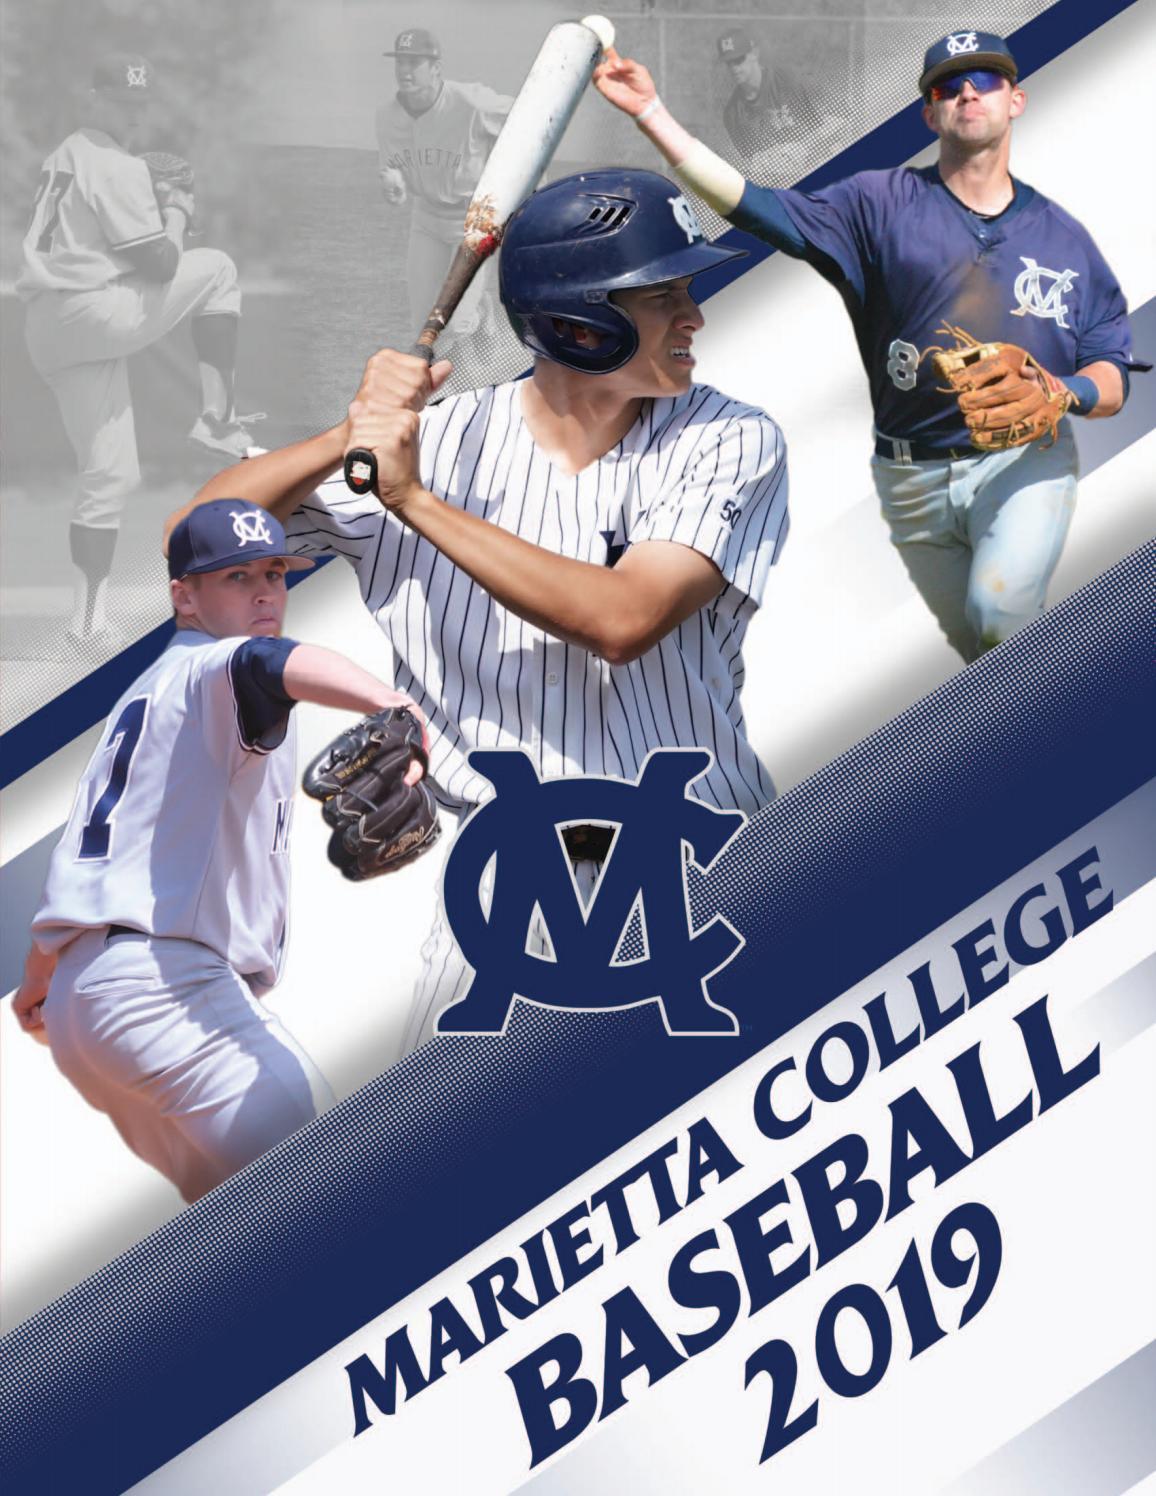 Mrs huntingdon smythe 2019 Baseball Yearbook By Marietta College Issuu